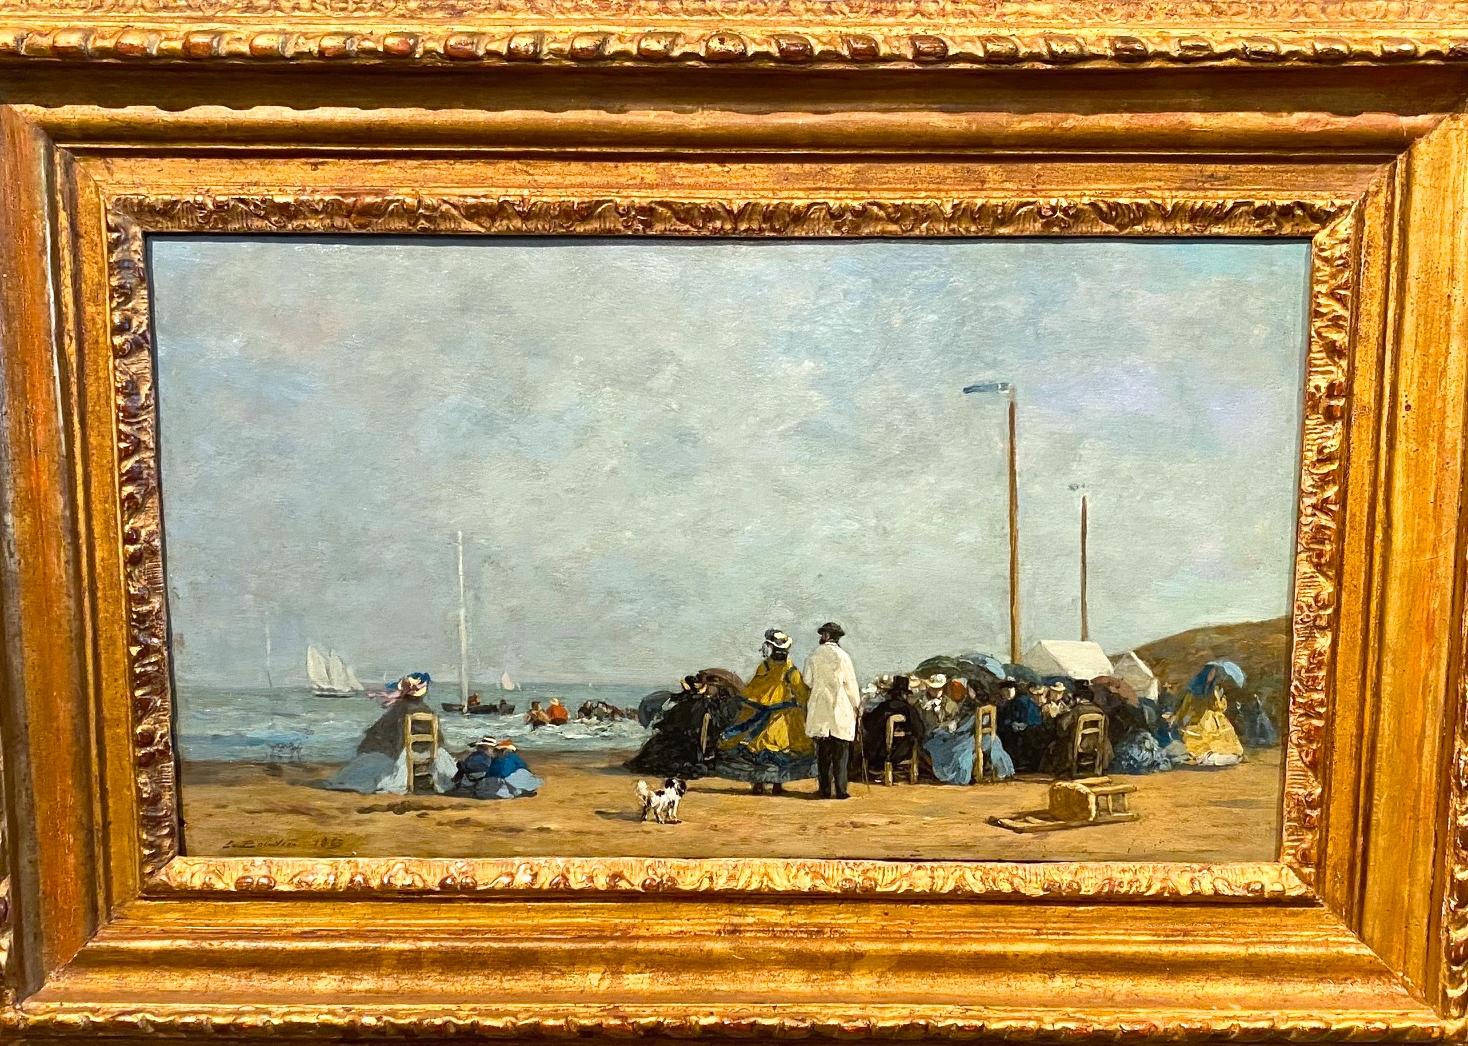 Eugène Boudin, Crinolines sur la plage, 1863